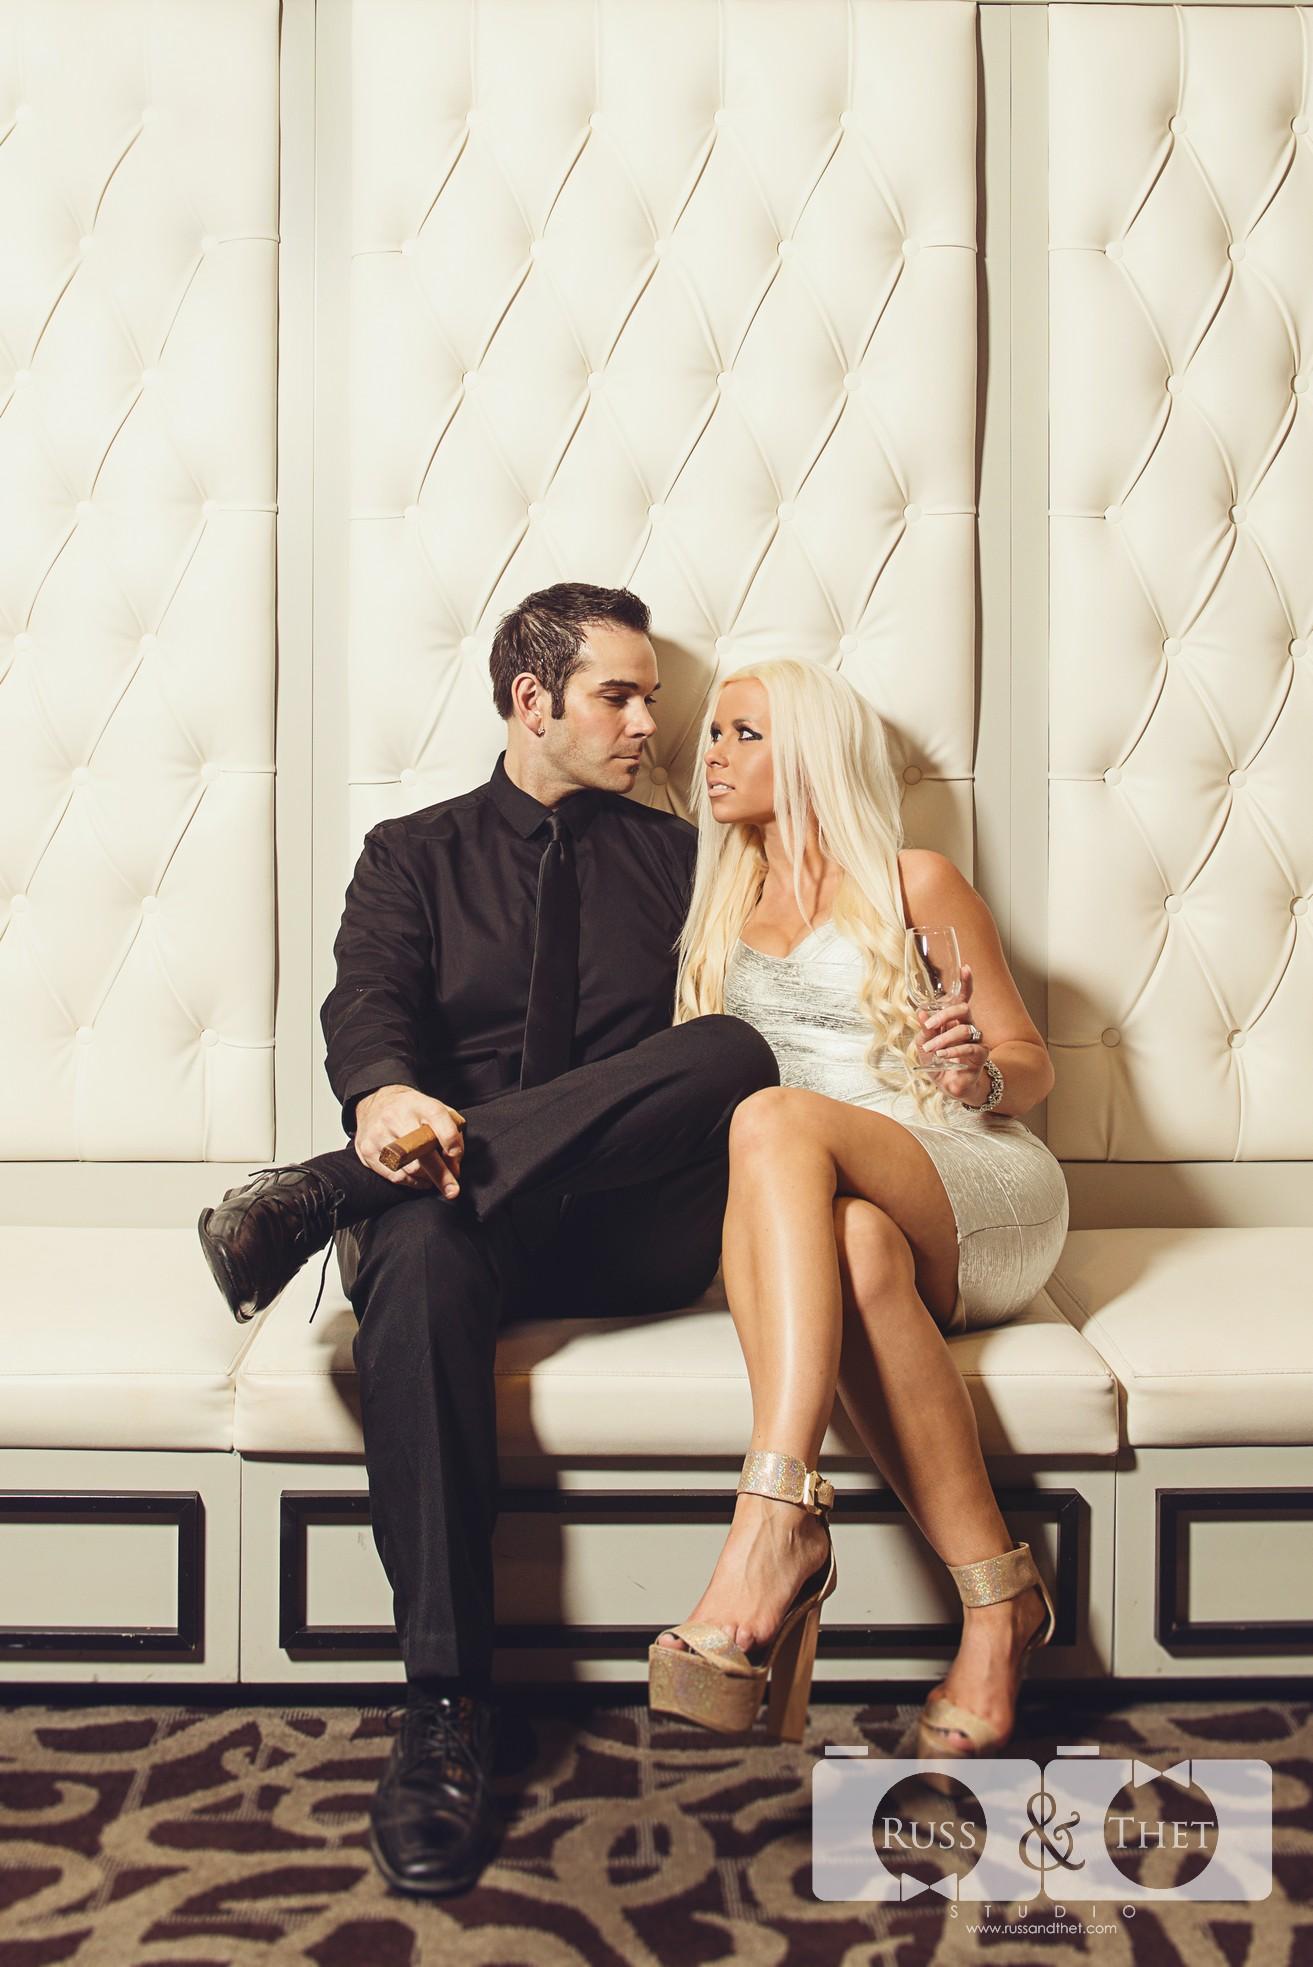 Jon&Kimee-The-Hills-Hotel-Engagement-Photographer (47).jpg